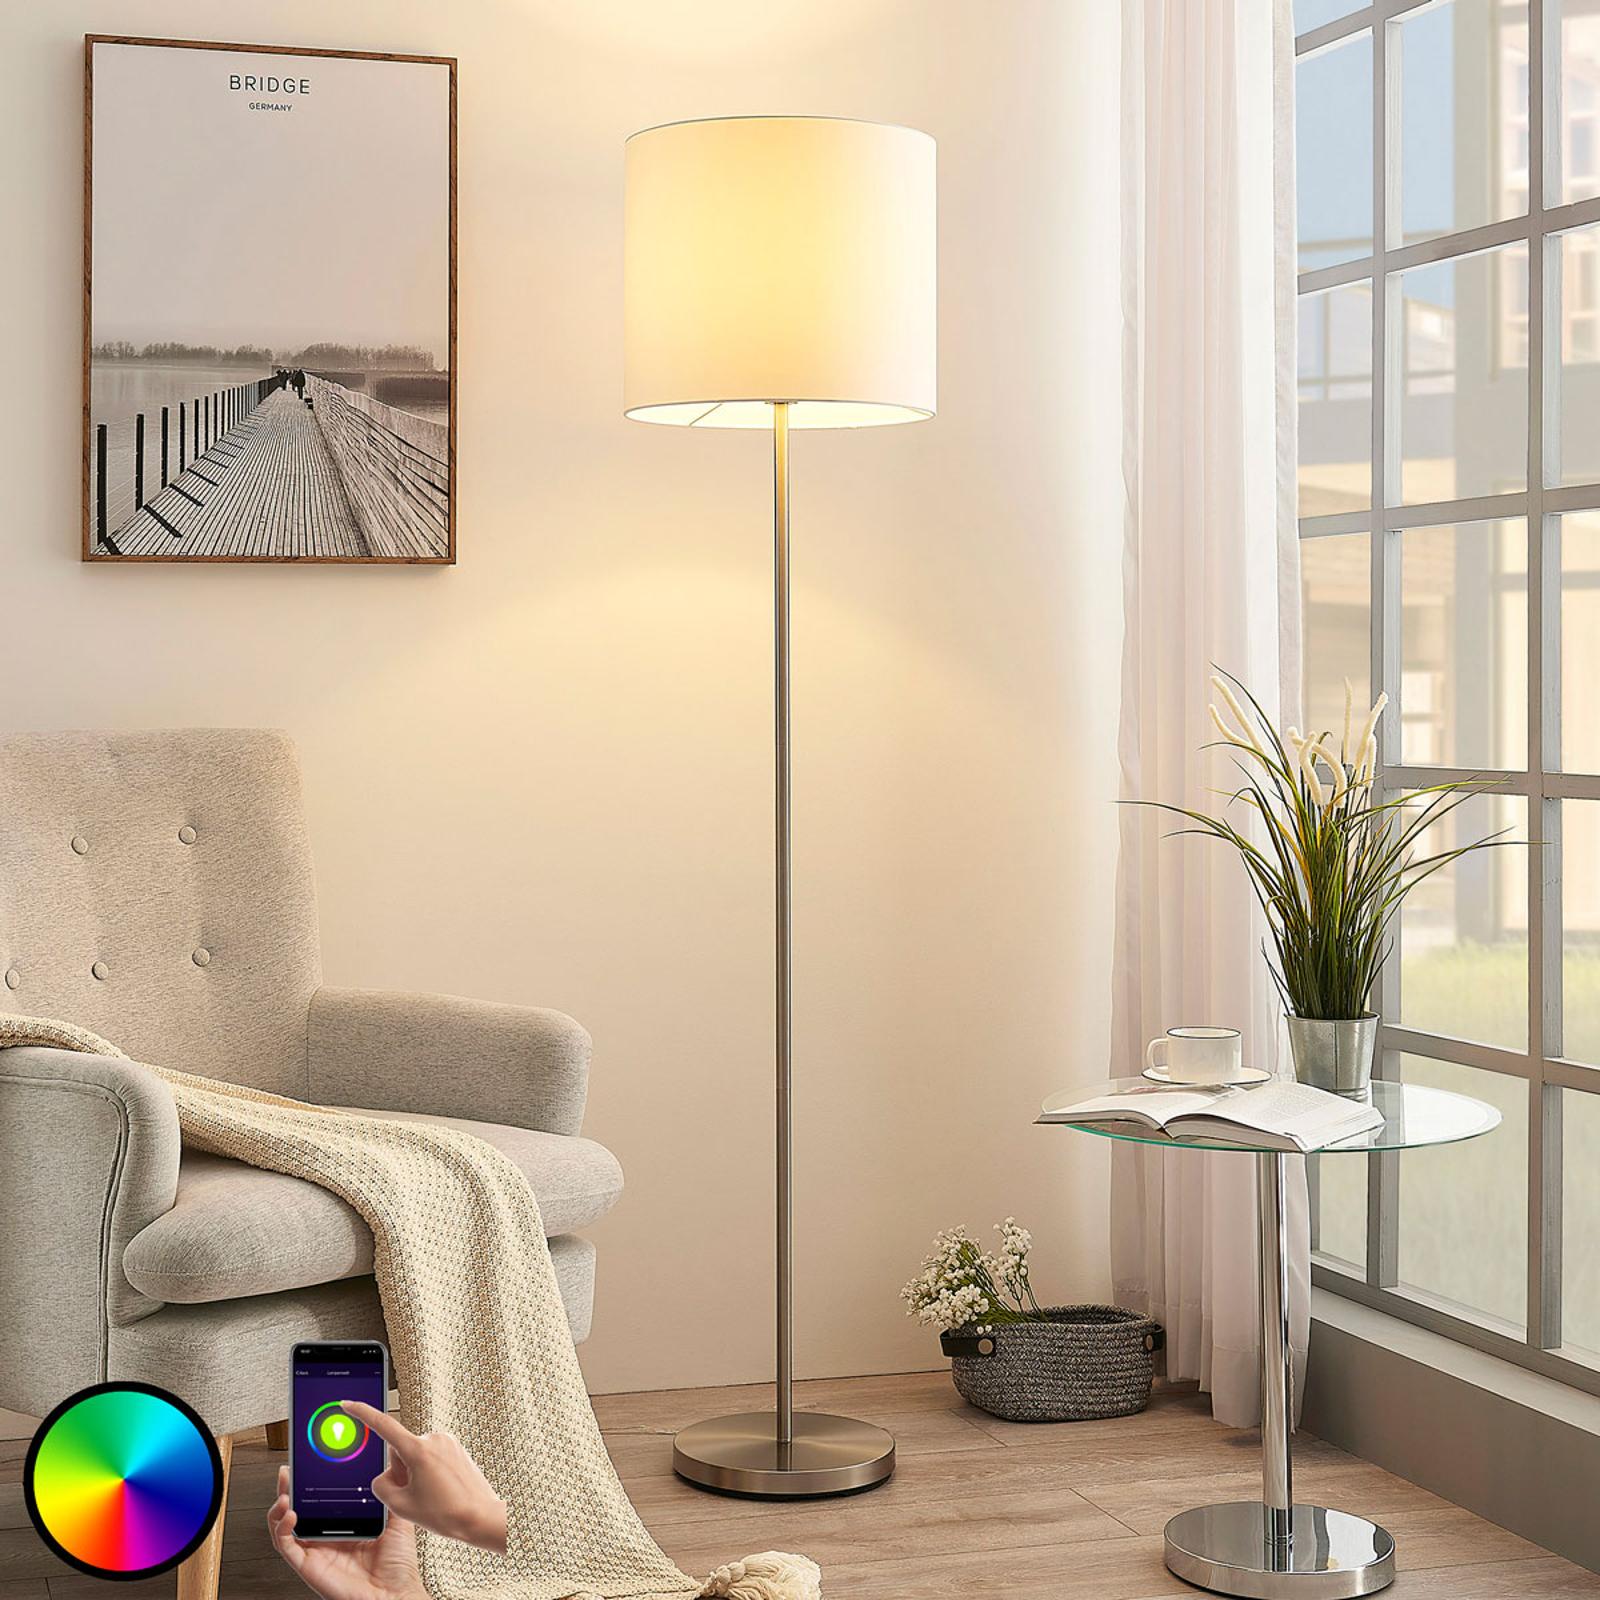 Lindby Smart LED vloerlamp Everly, app, RGB